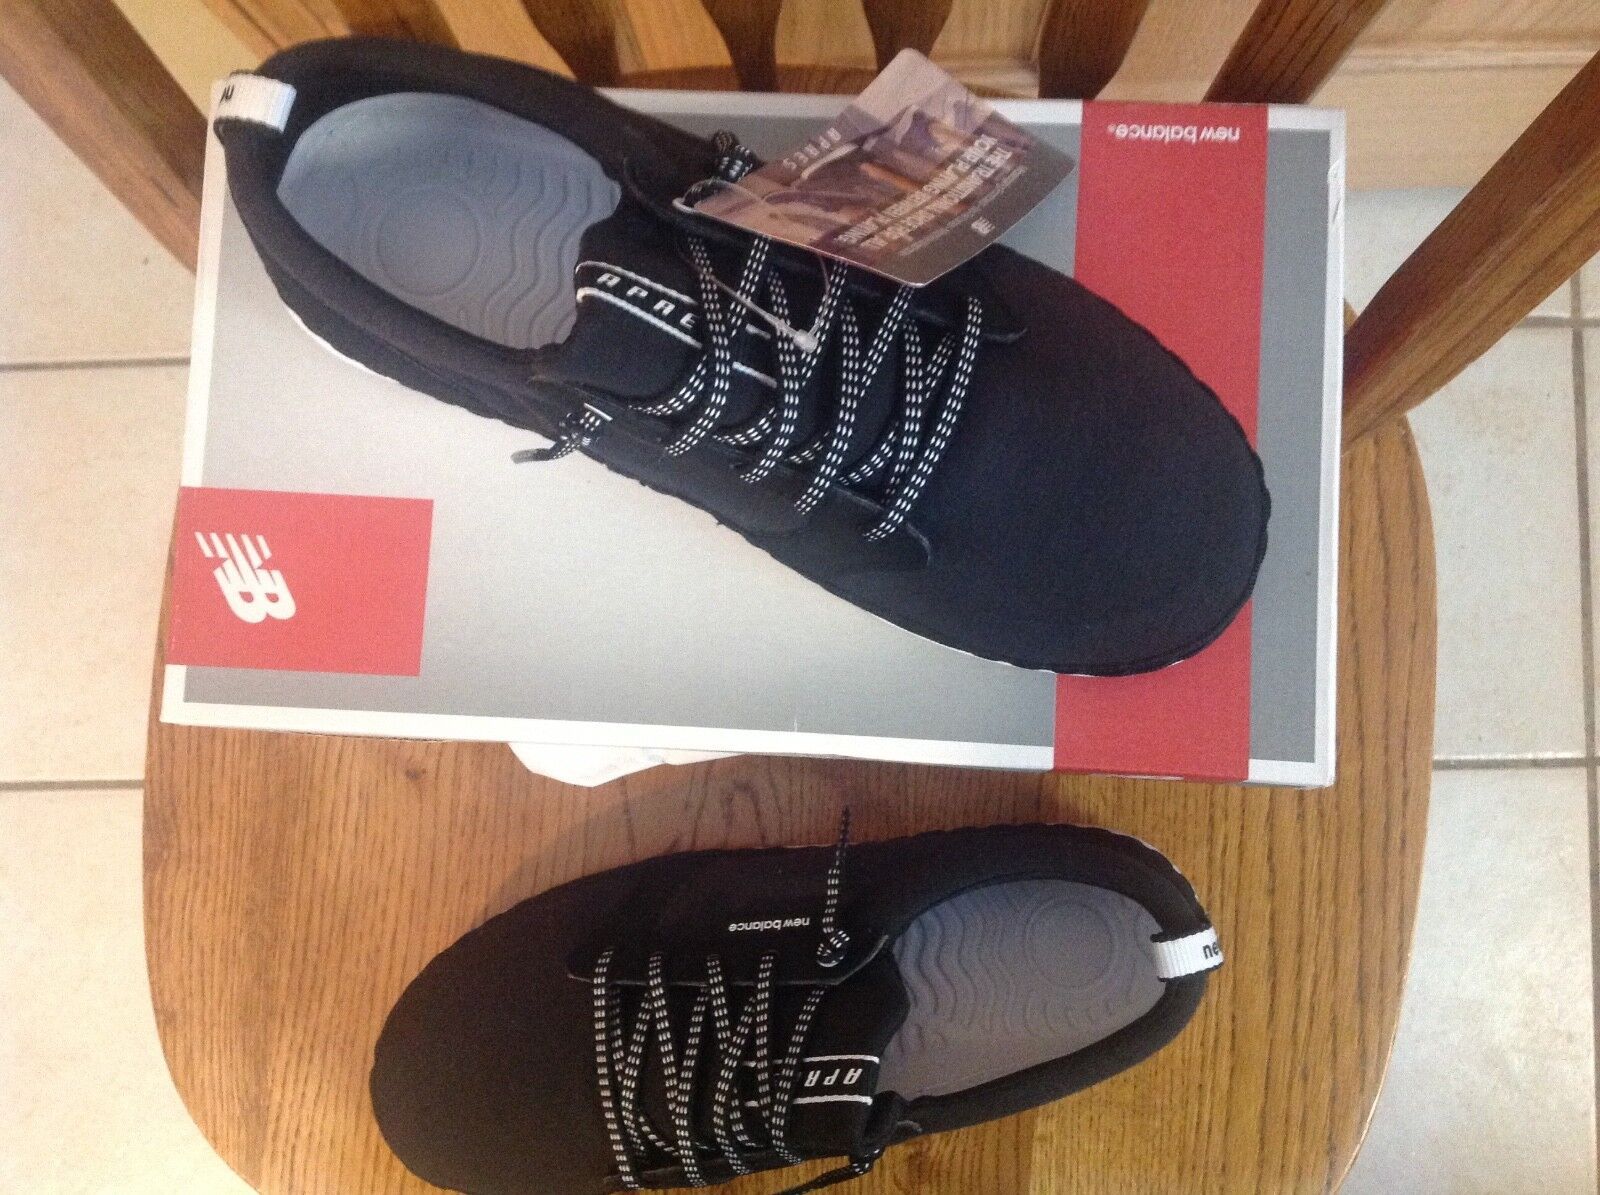 NEW-New Balance Men's Transitional Shoes-Croc like/Slide/Floats (Apres bhh)  1